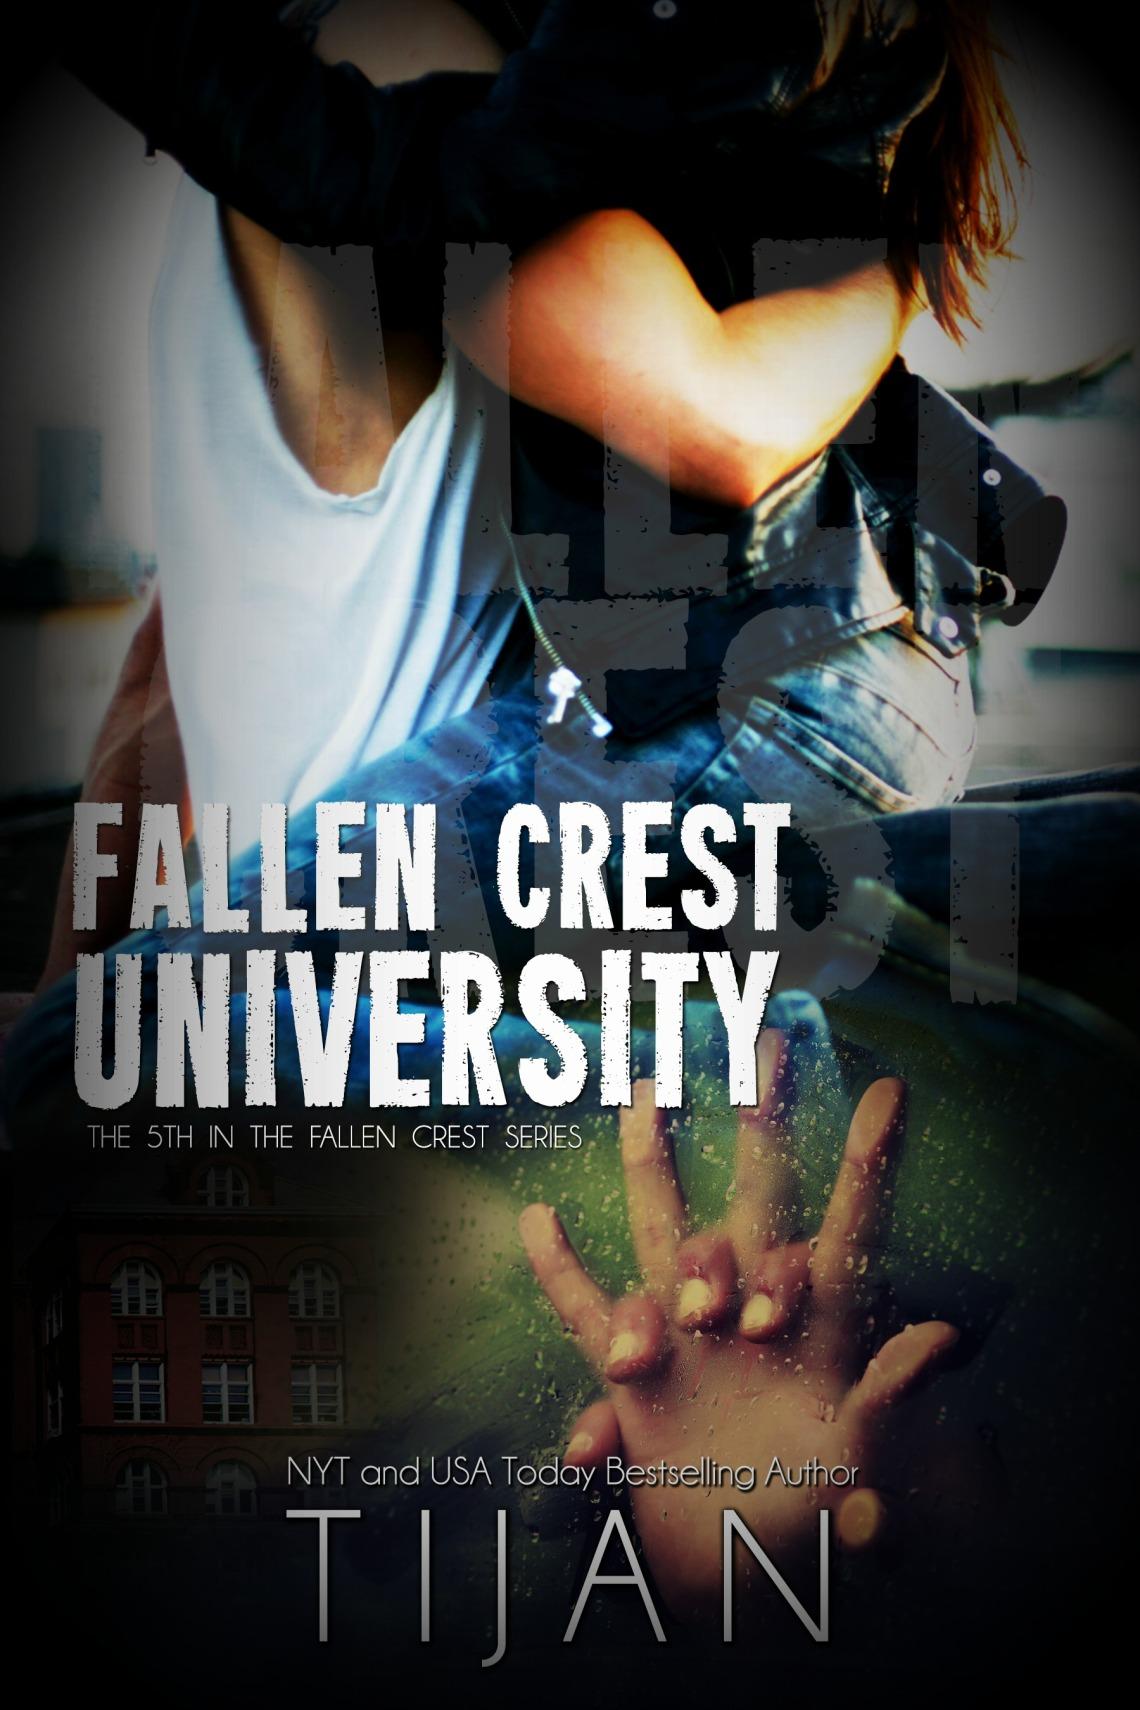 Fallen Crest University Ebook Cover